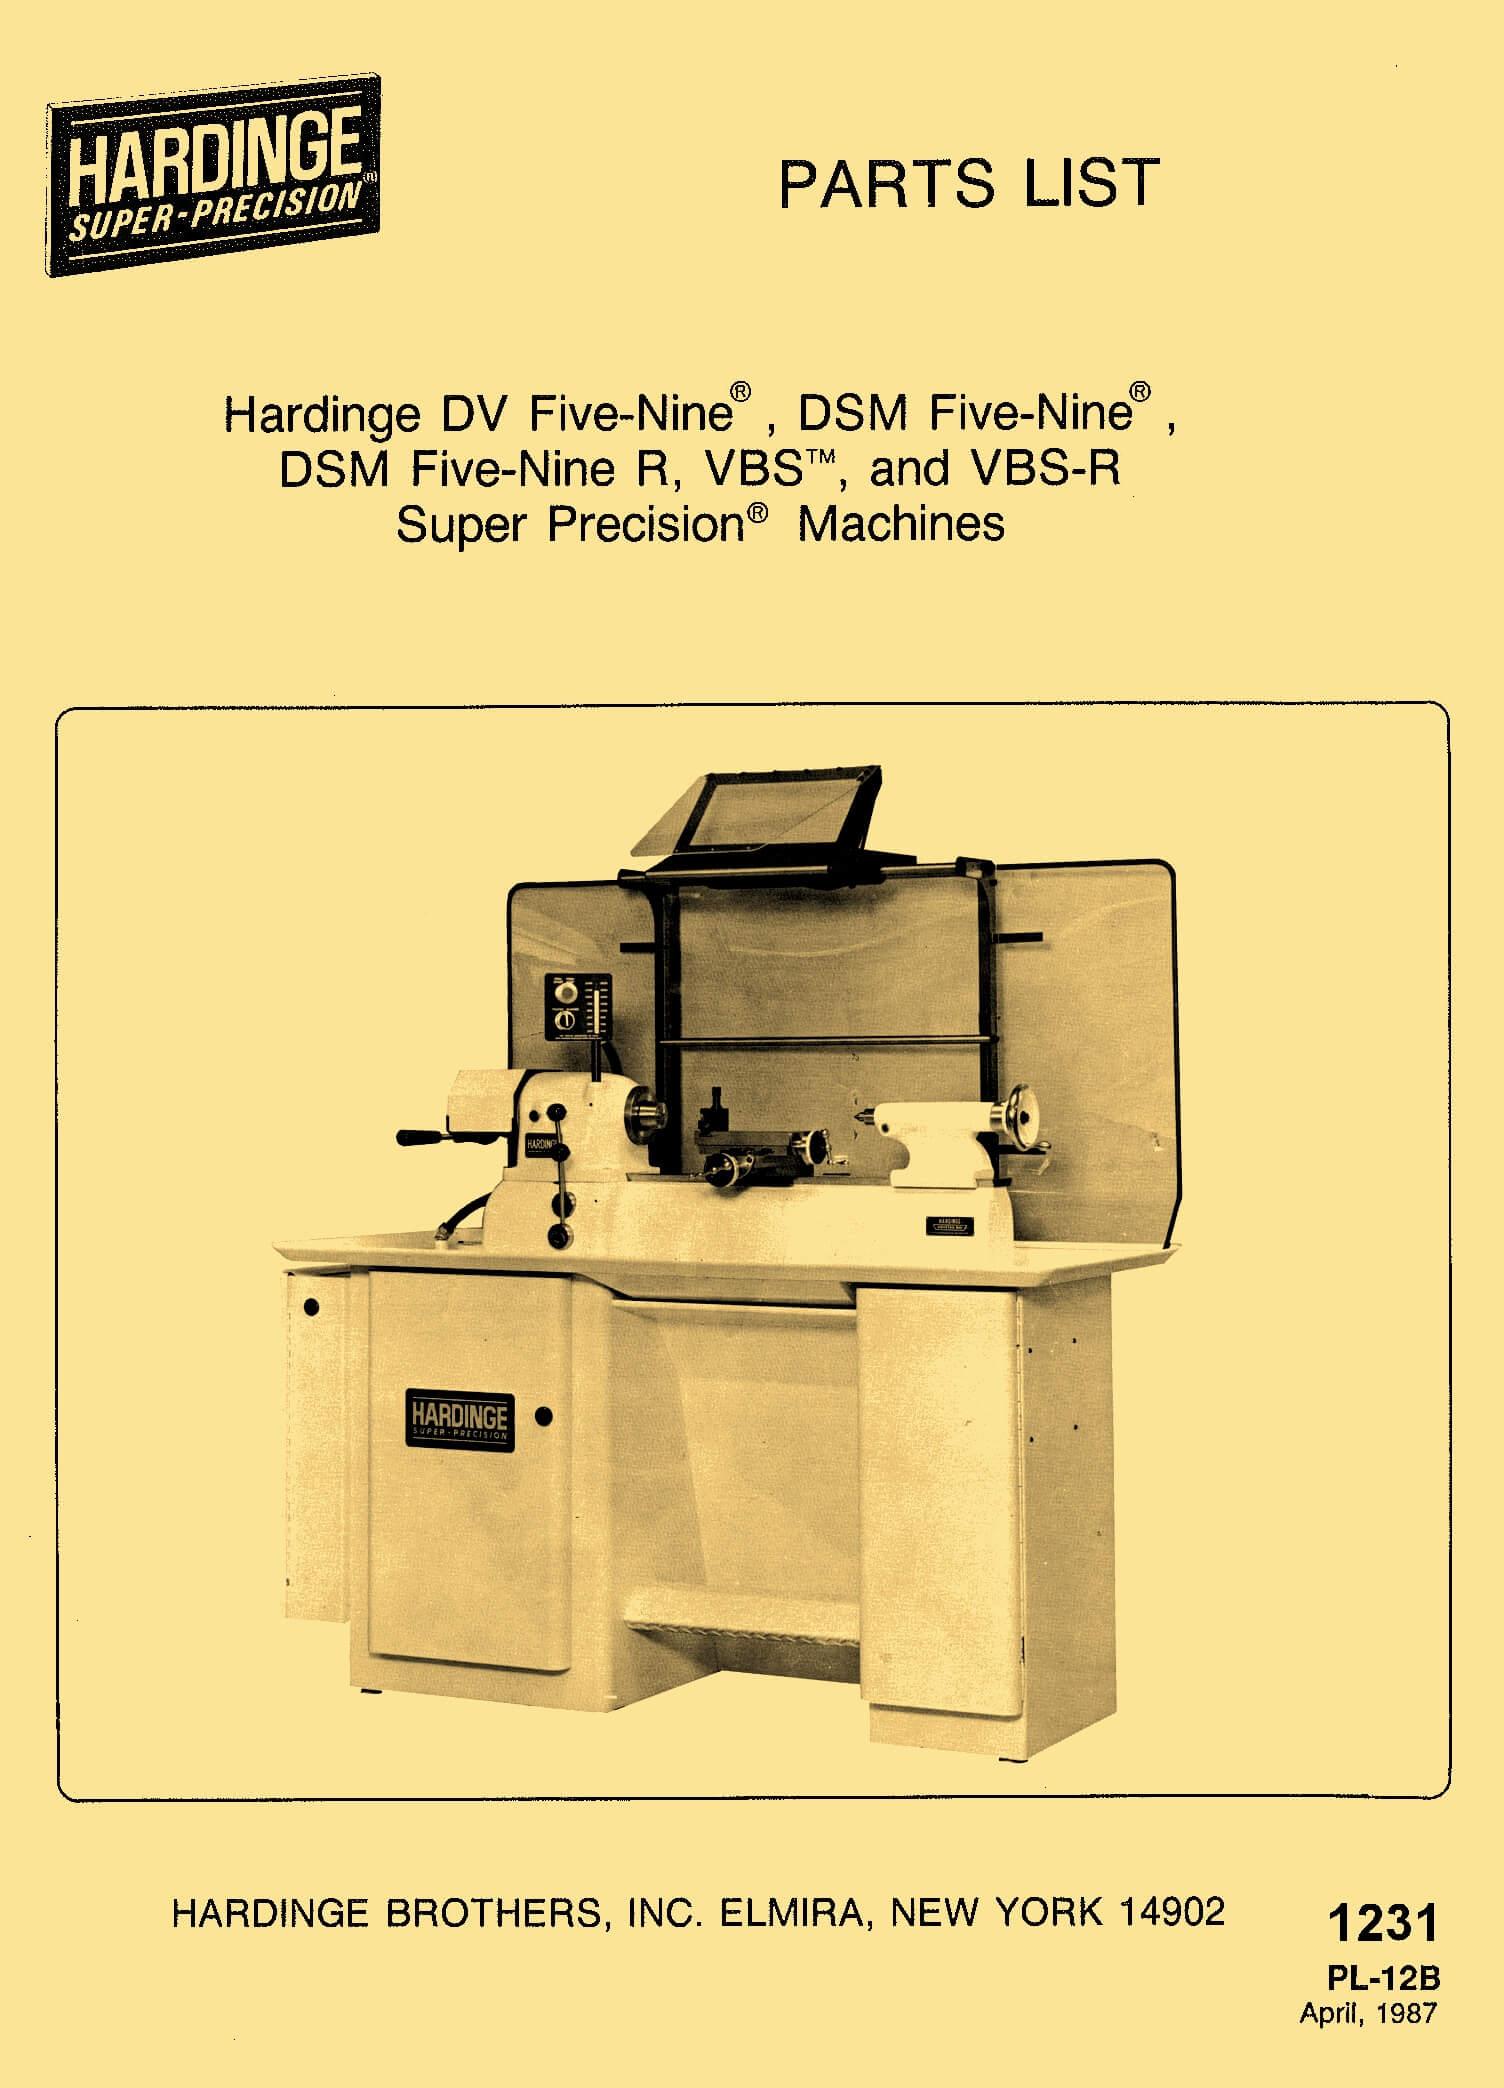 DV-59, DSM-59, DSM-59R, VBS, VBS-R Hardinge Super Precision Lathe Parts List